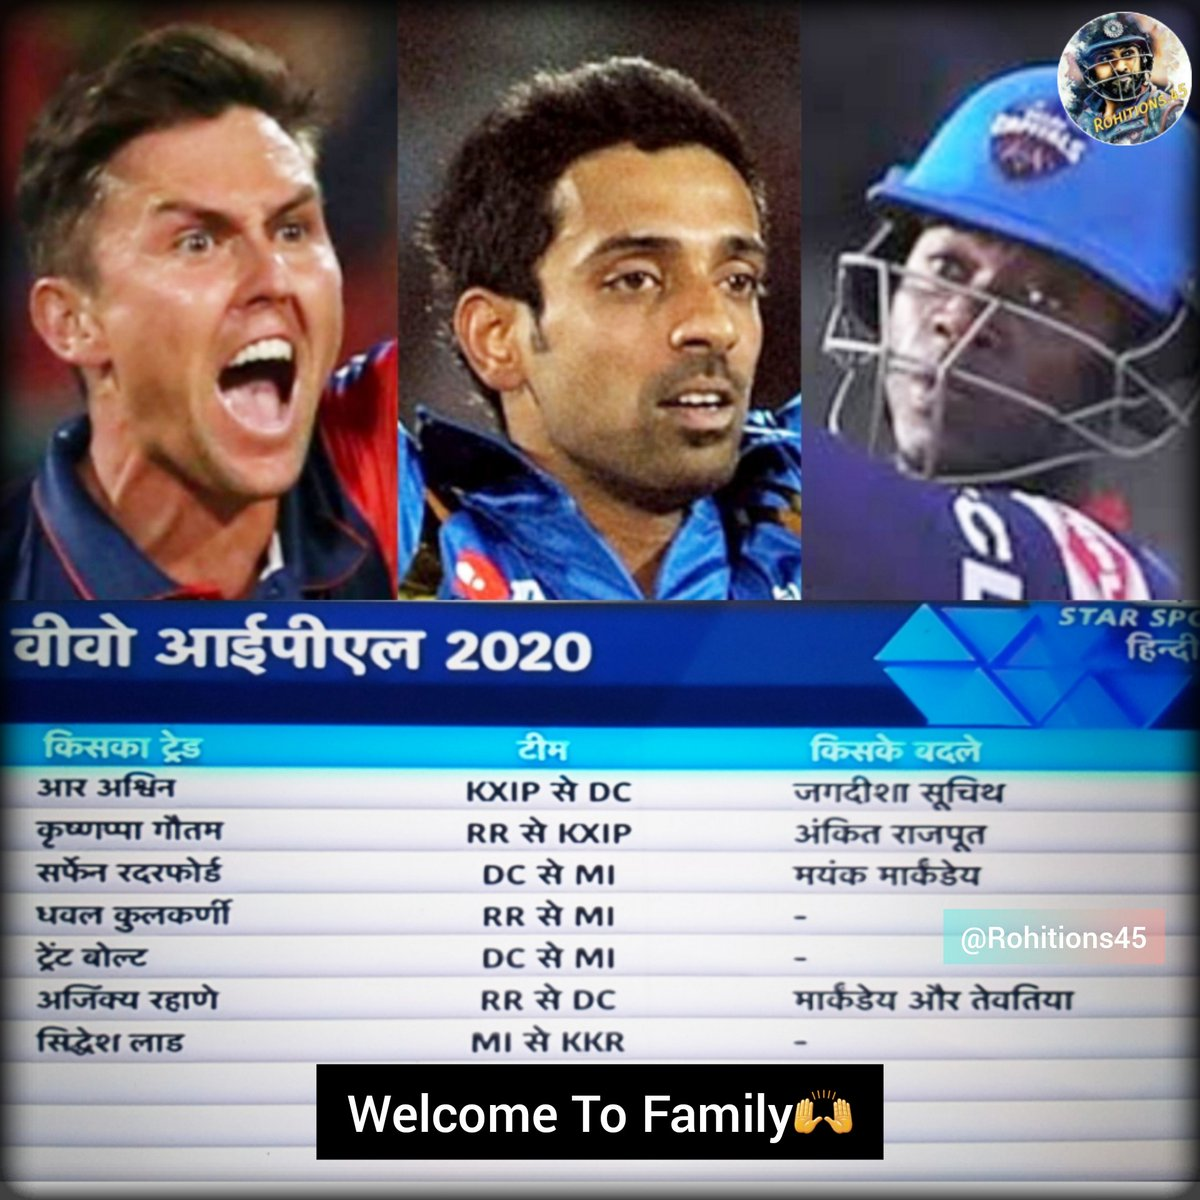 Welcome To Family @trent_boult @dhawal_kulkarni  🙌#TeamIndia #rohitions45 #indvssa #indvsa #rohitopensagain #rohitsharma #rohitsharma45